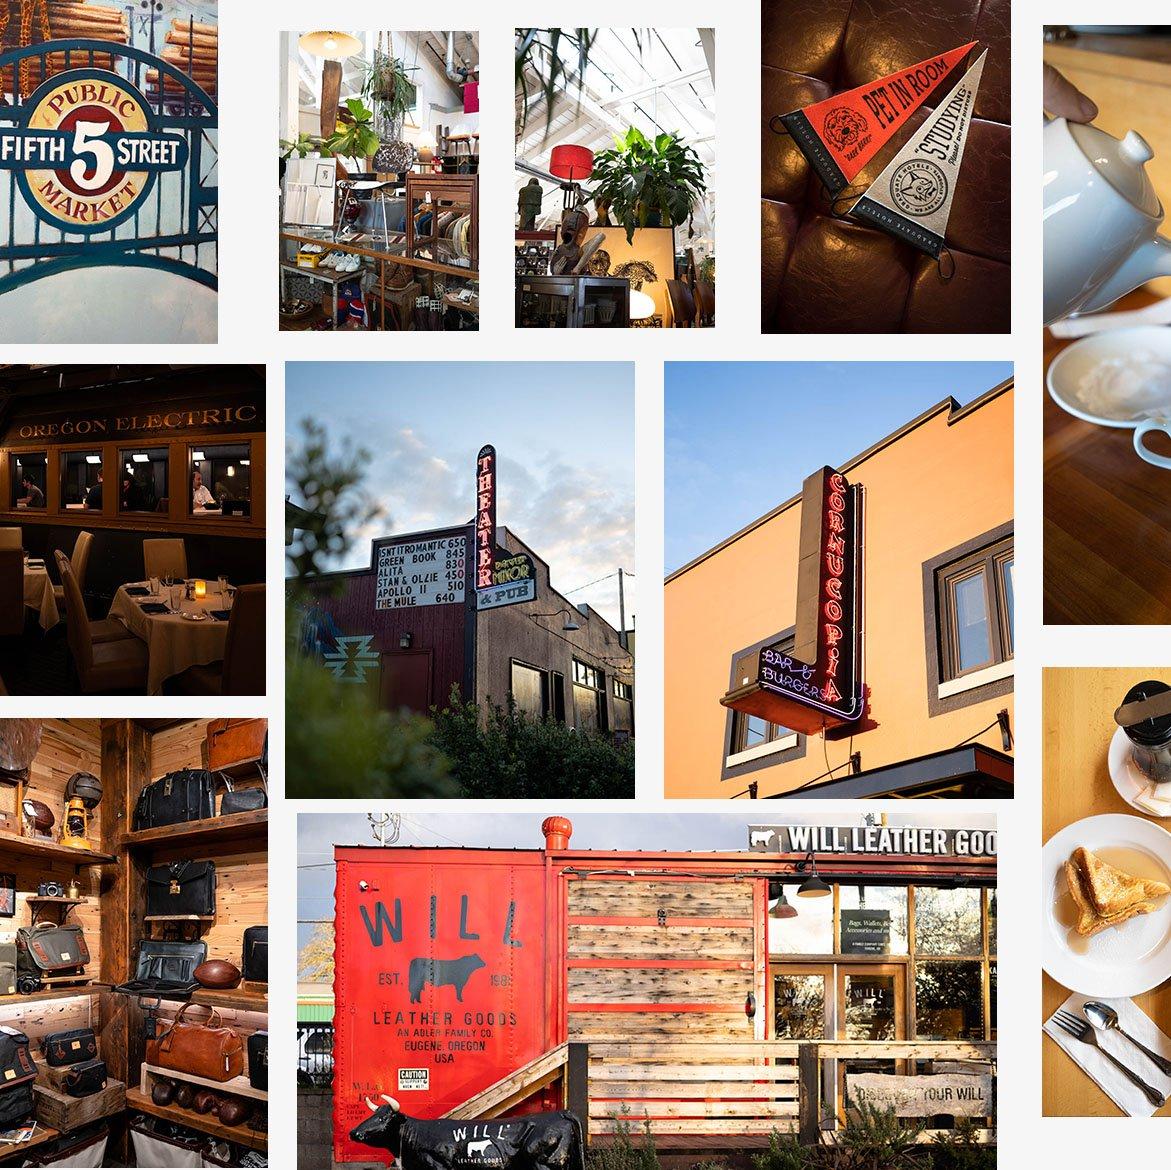 Collage of images showing Eugene, Oregon